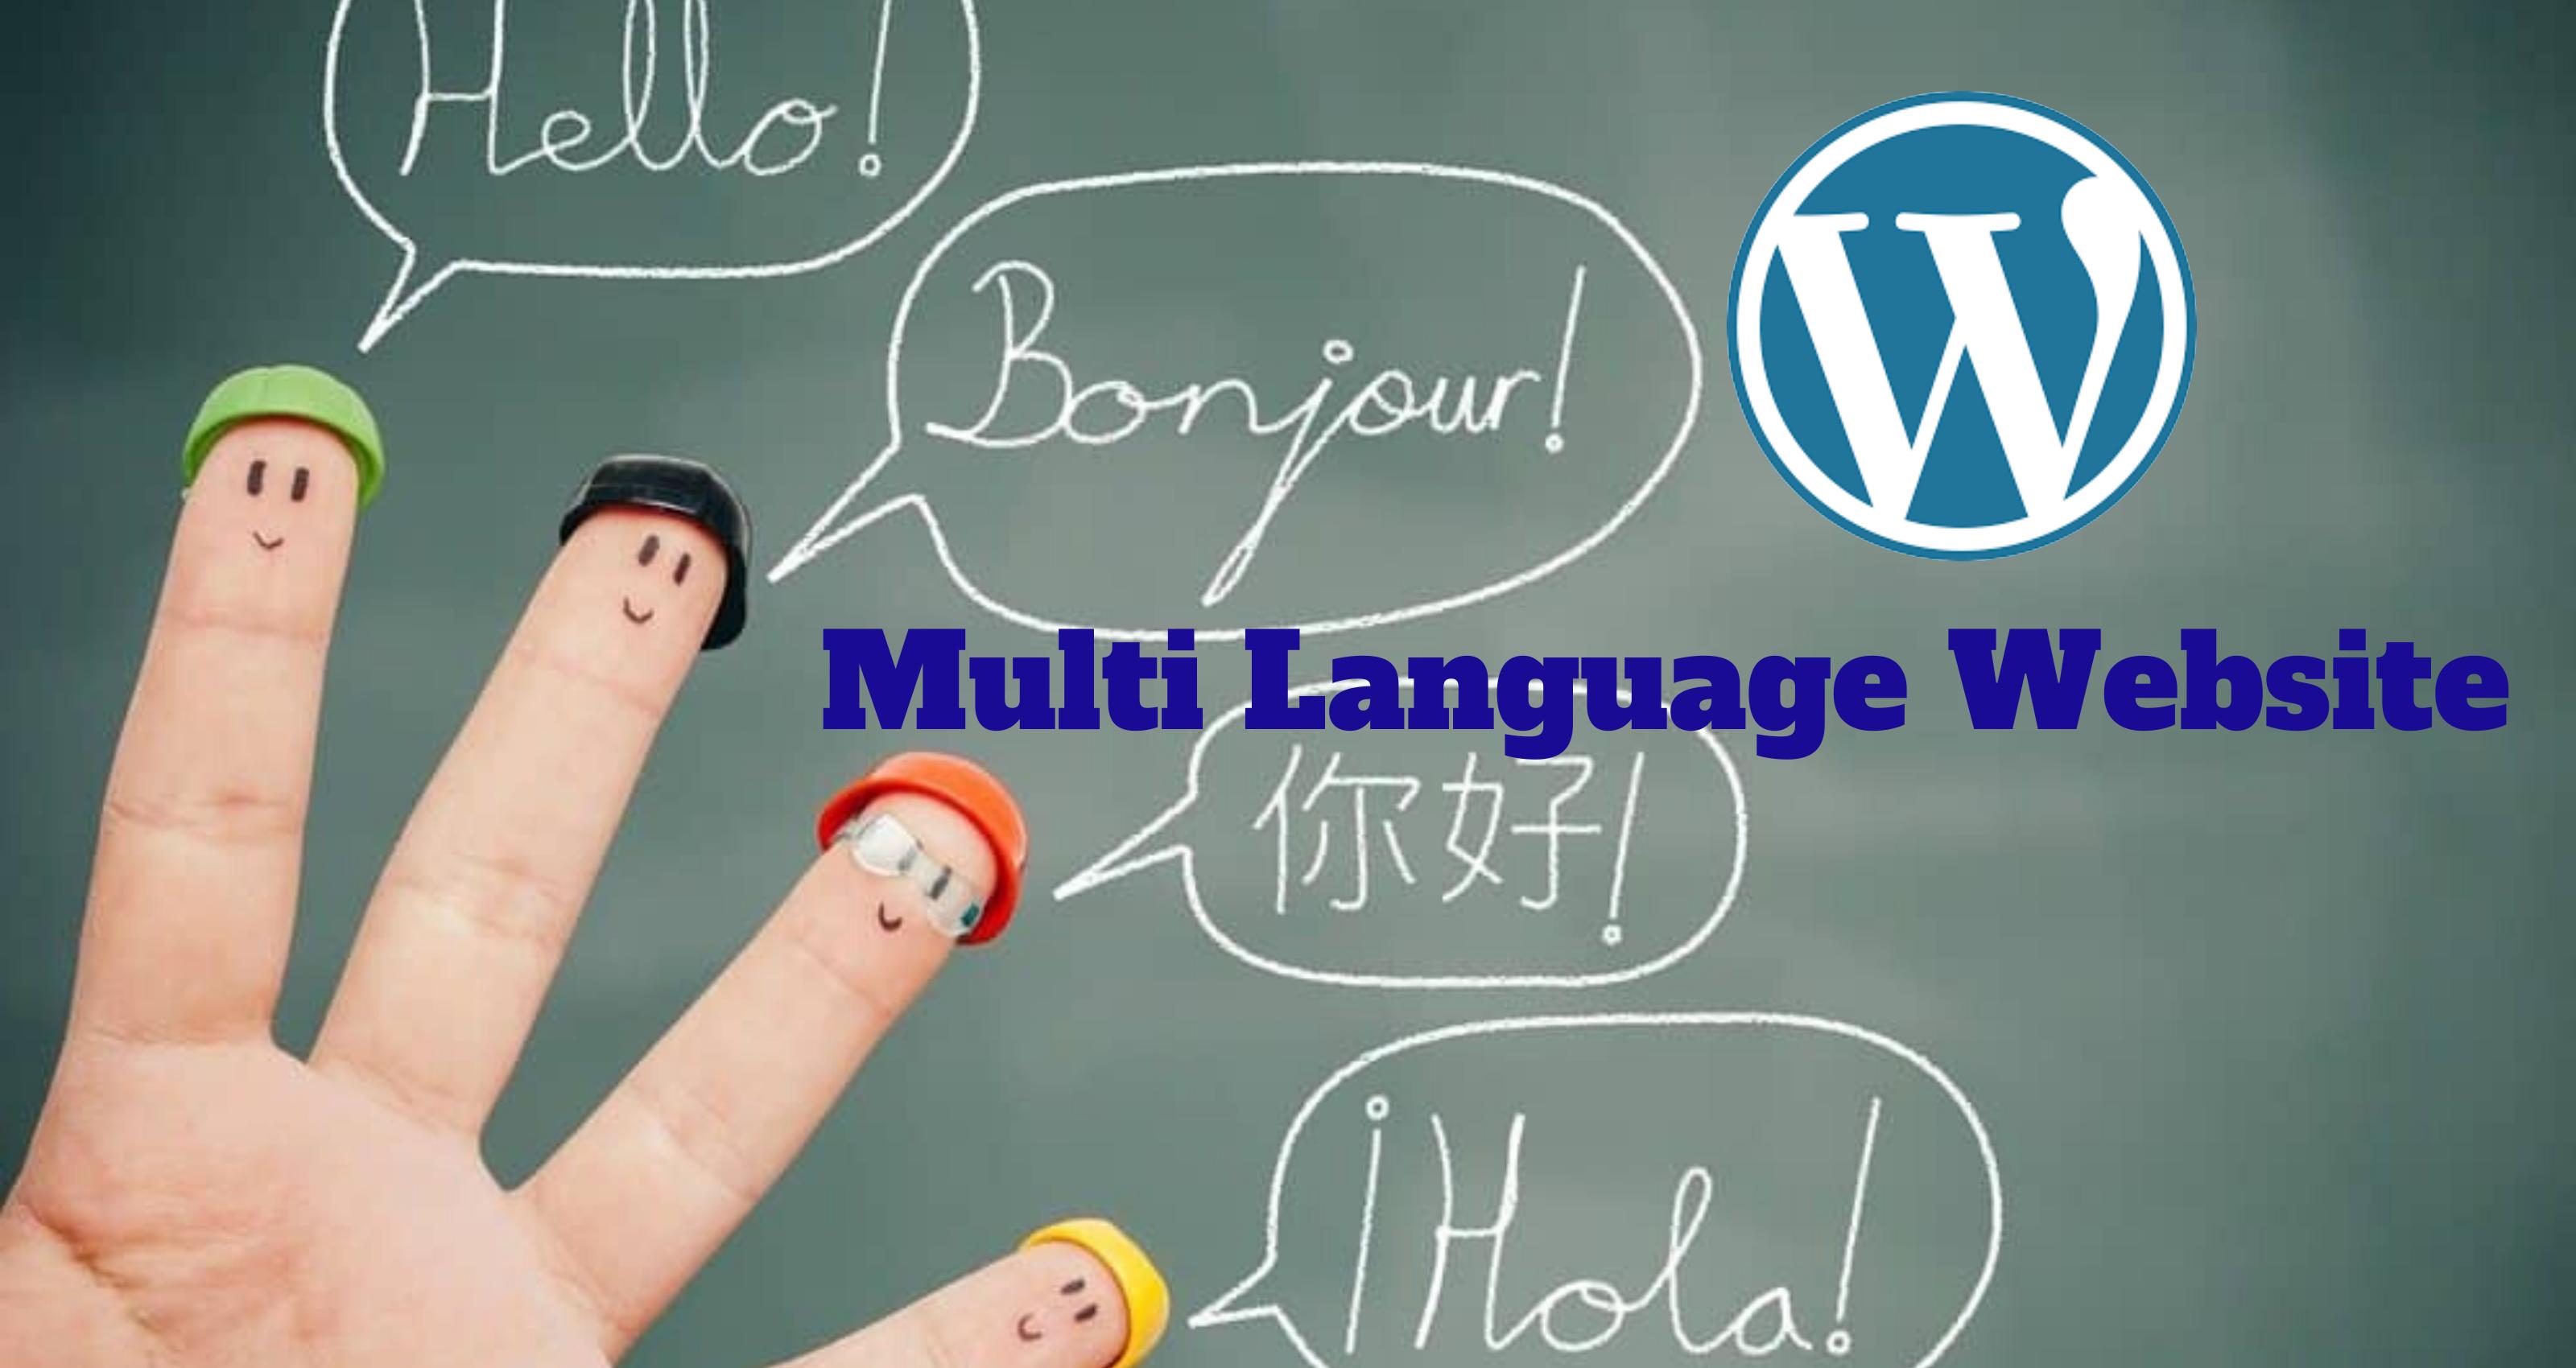 Benefits of Having a WordPress Multi Language Website